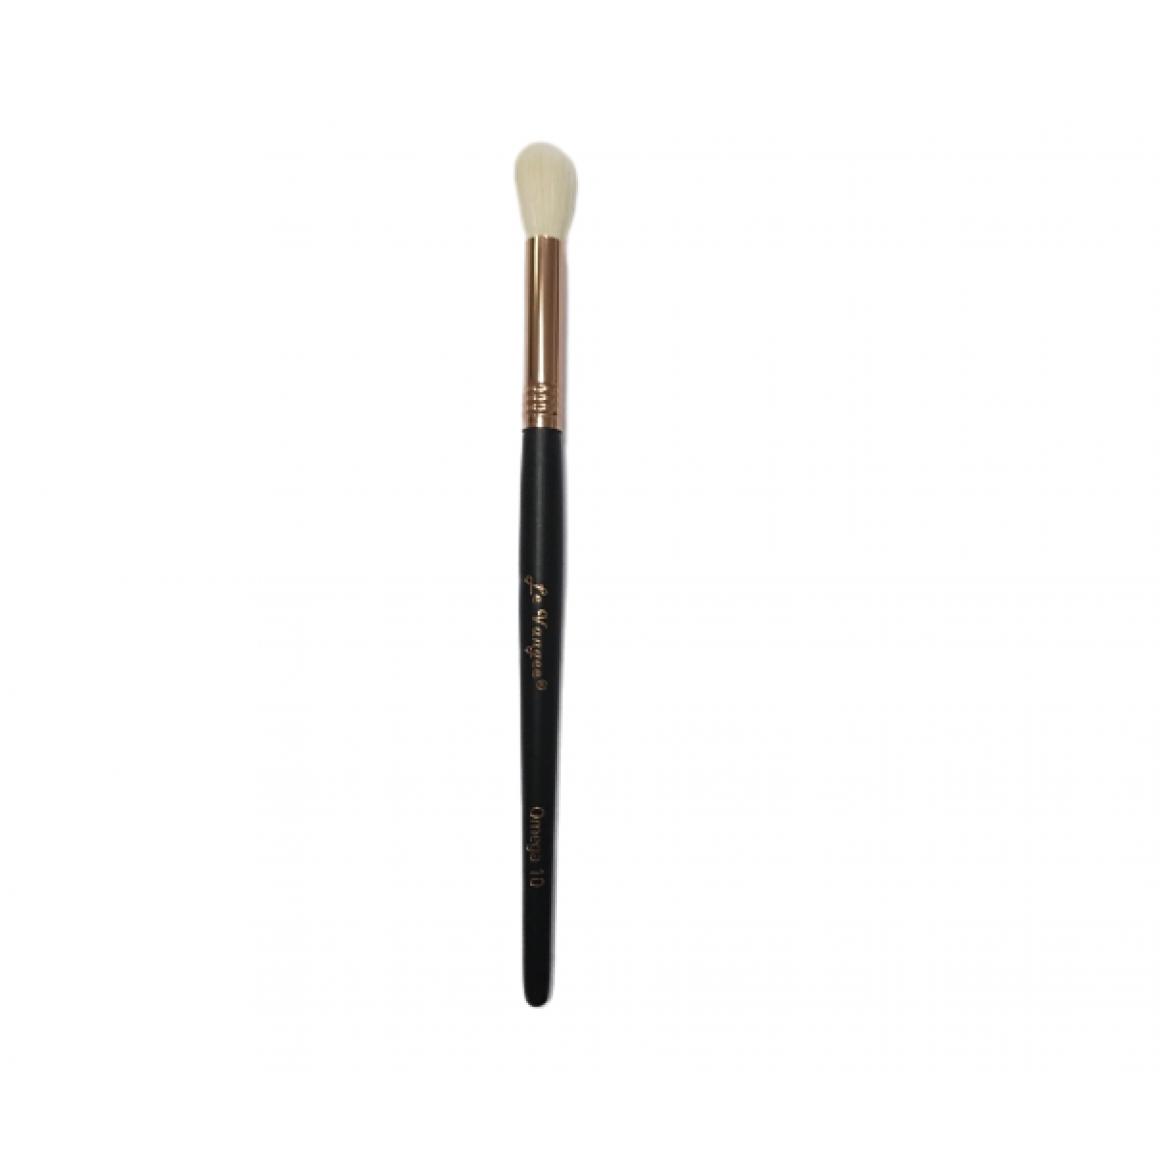 Pincel Oval para esfumar Omega 10 - Le Vangee